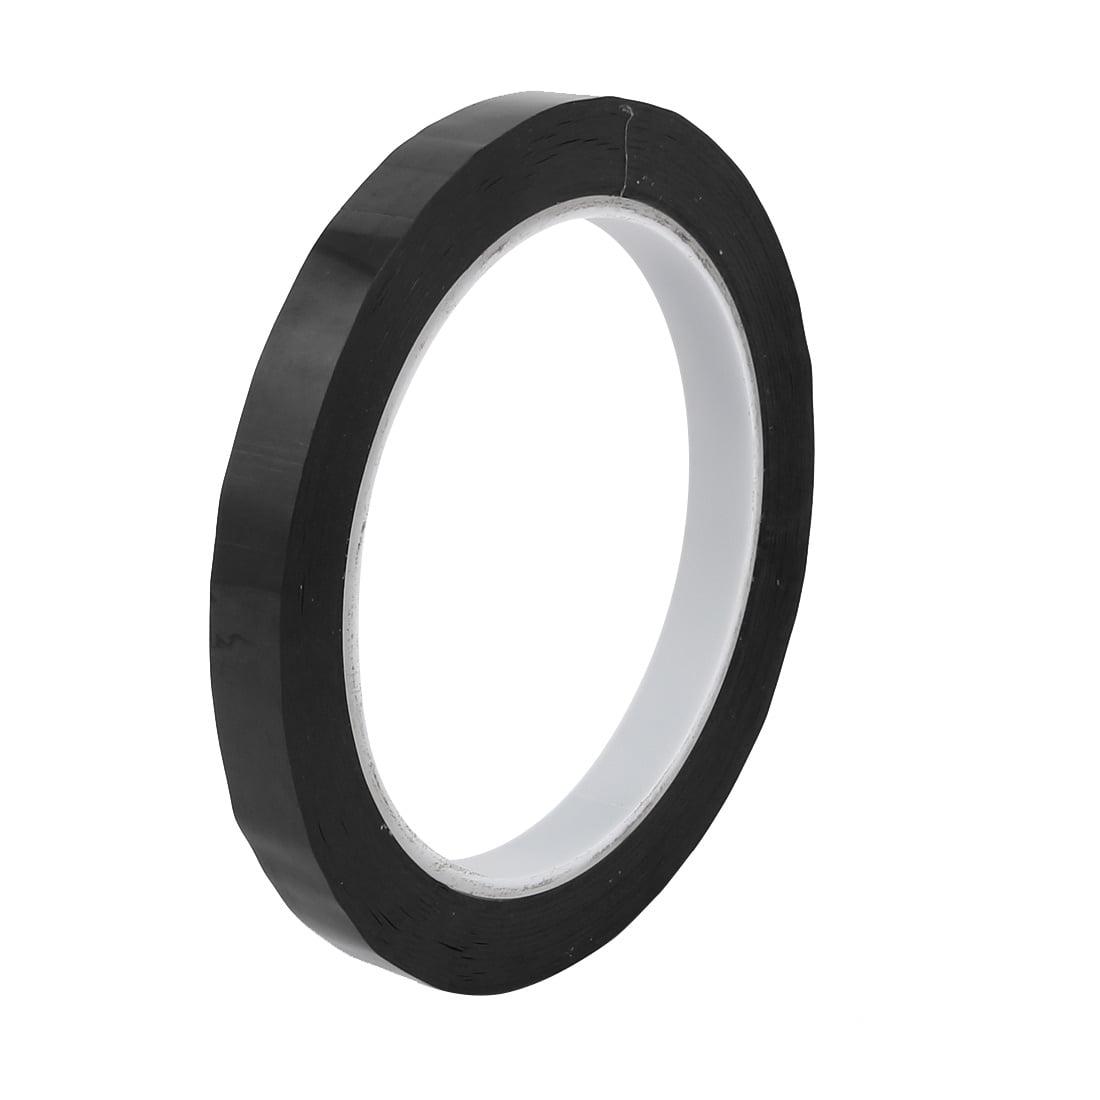 2pcs 10mm Width 66M Length Single-side Position Sign Sticker Marking Tape Black - image 1 de 3